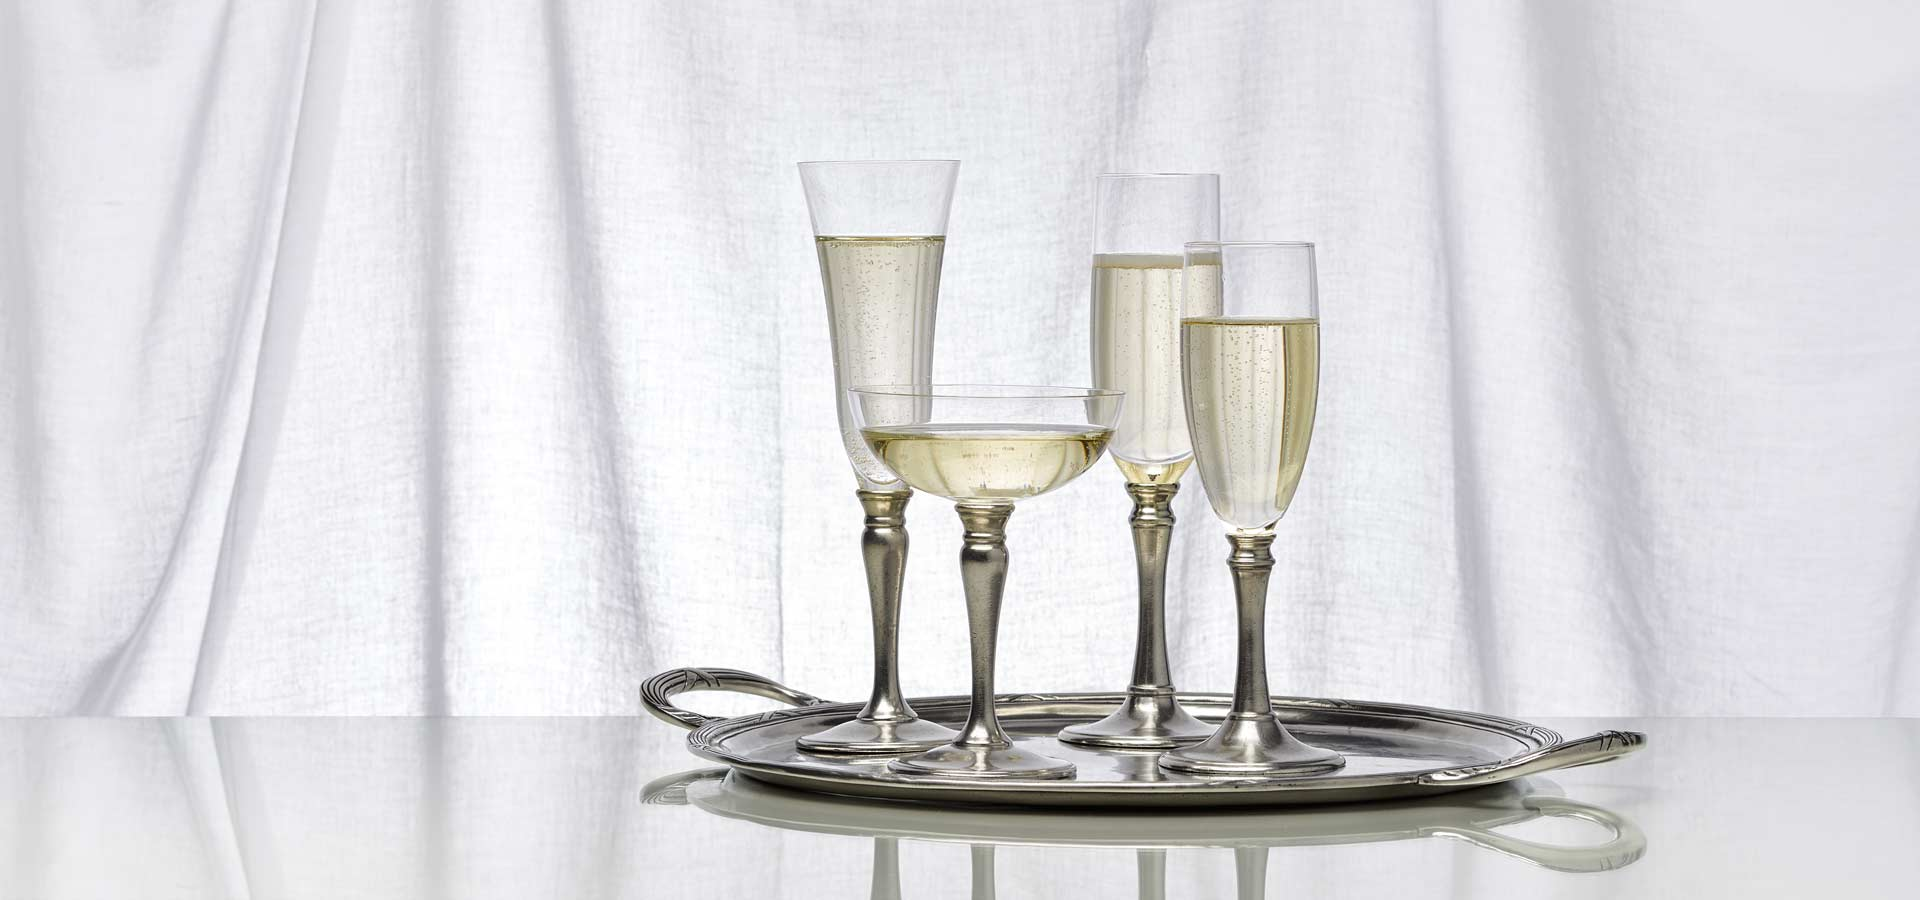 glasses, goblets, tumblers